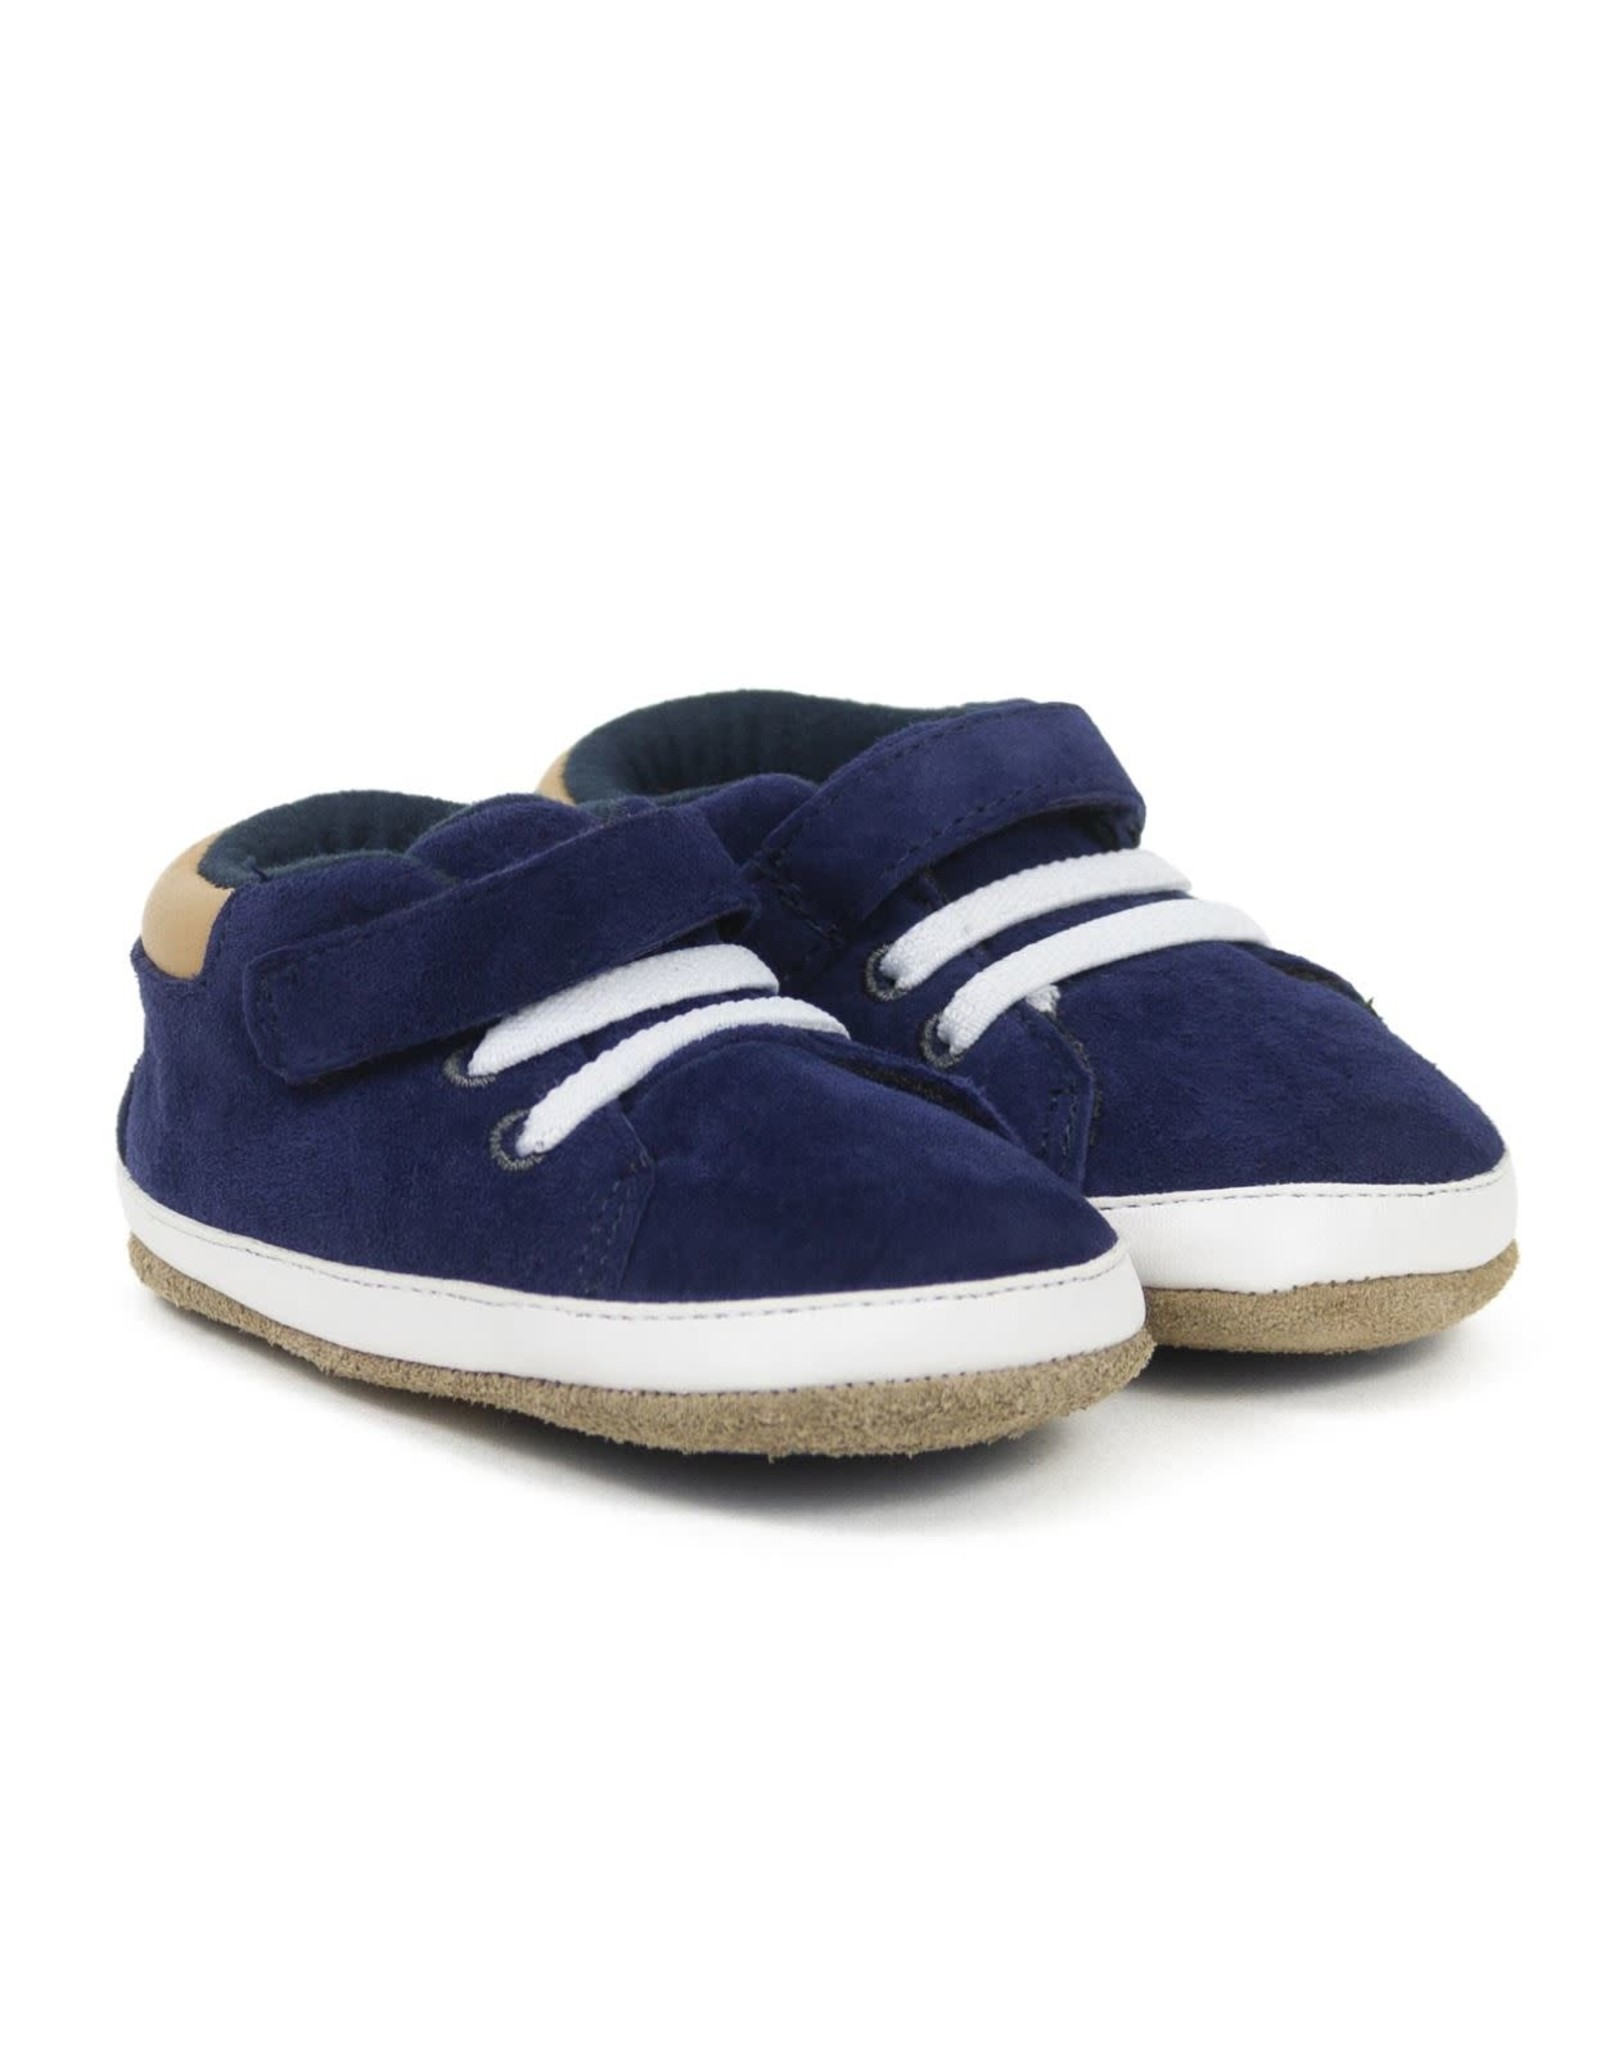 Robeez Jensen Sneakers First Kicks